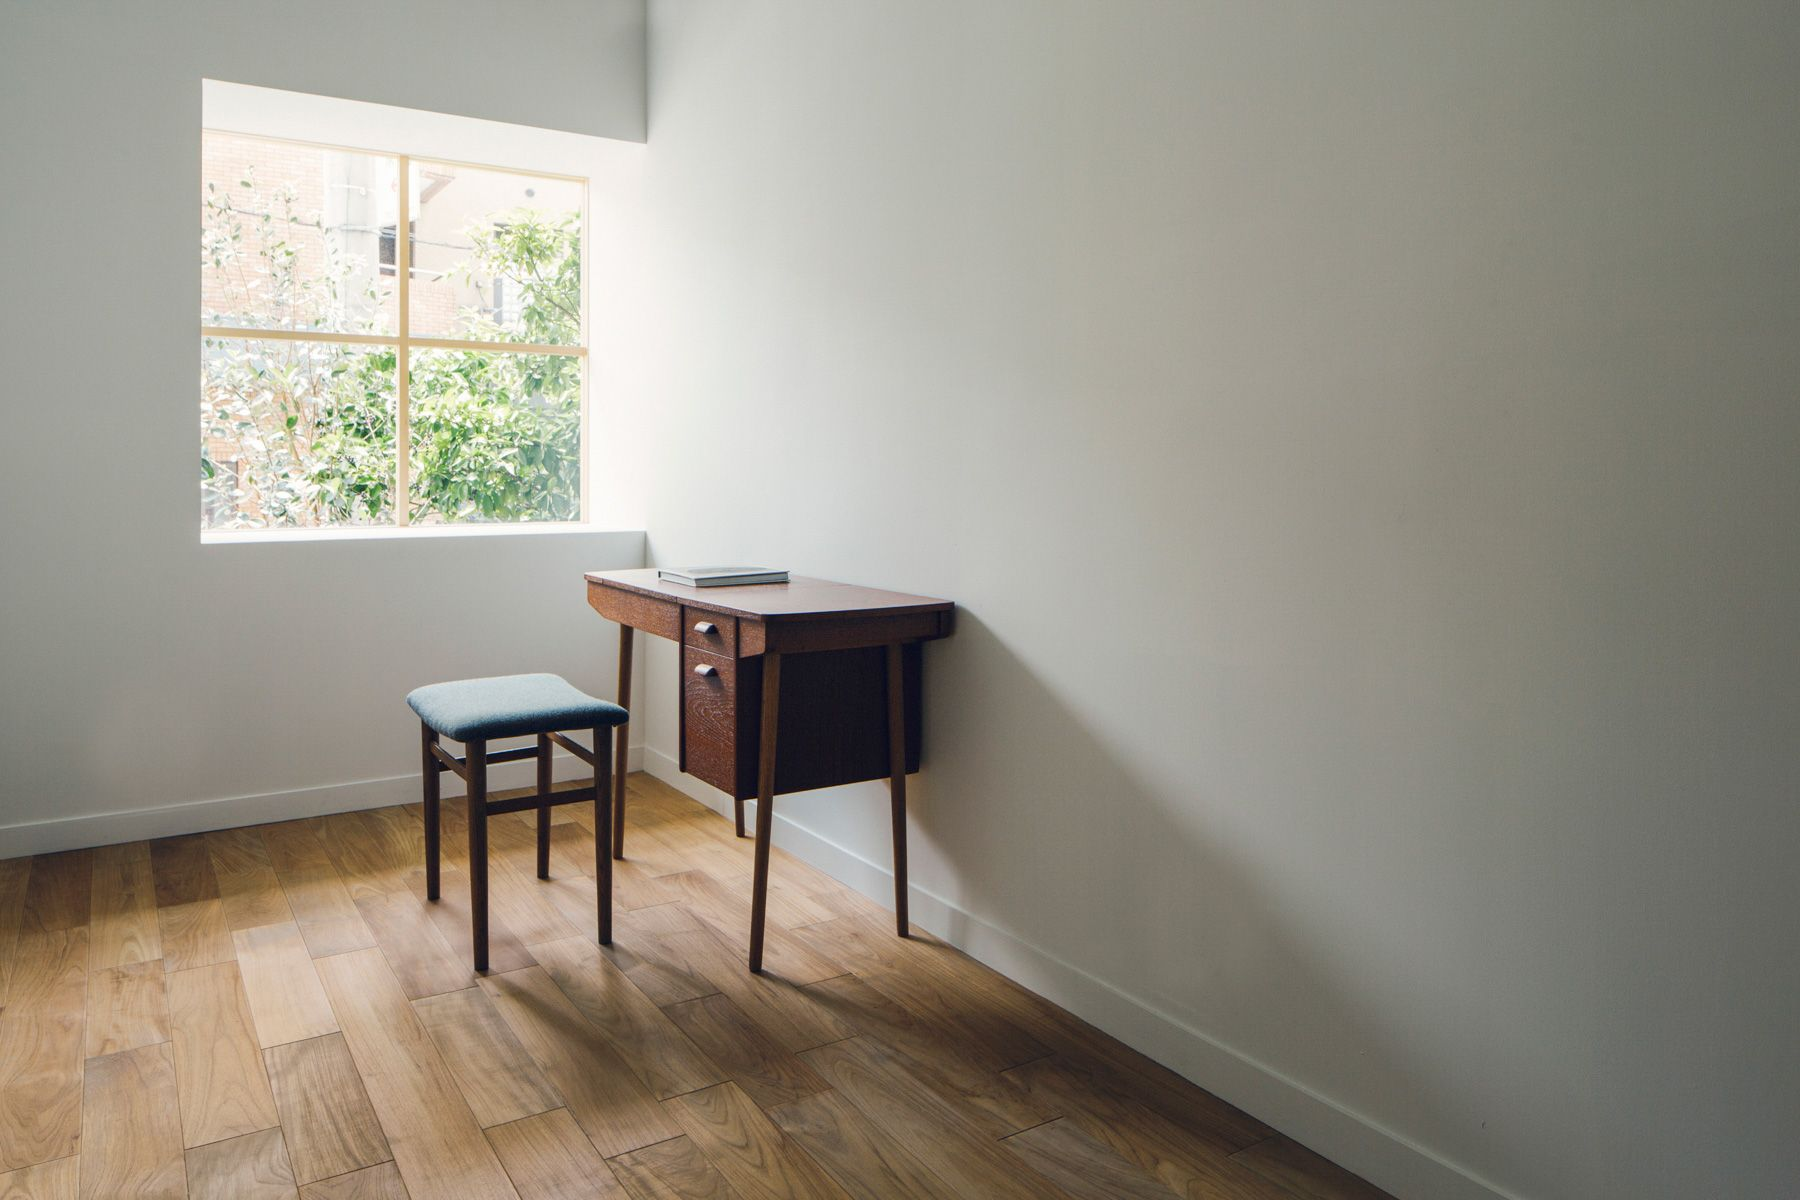 ferme studio  (フェルム スタジオ)study room